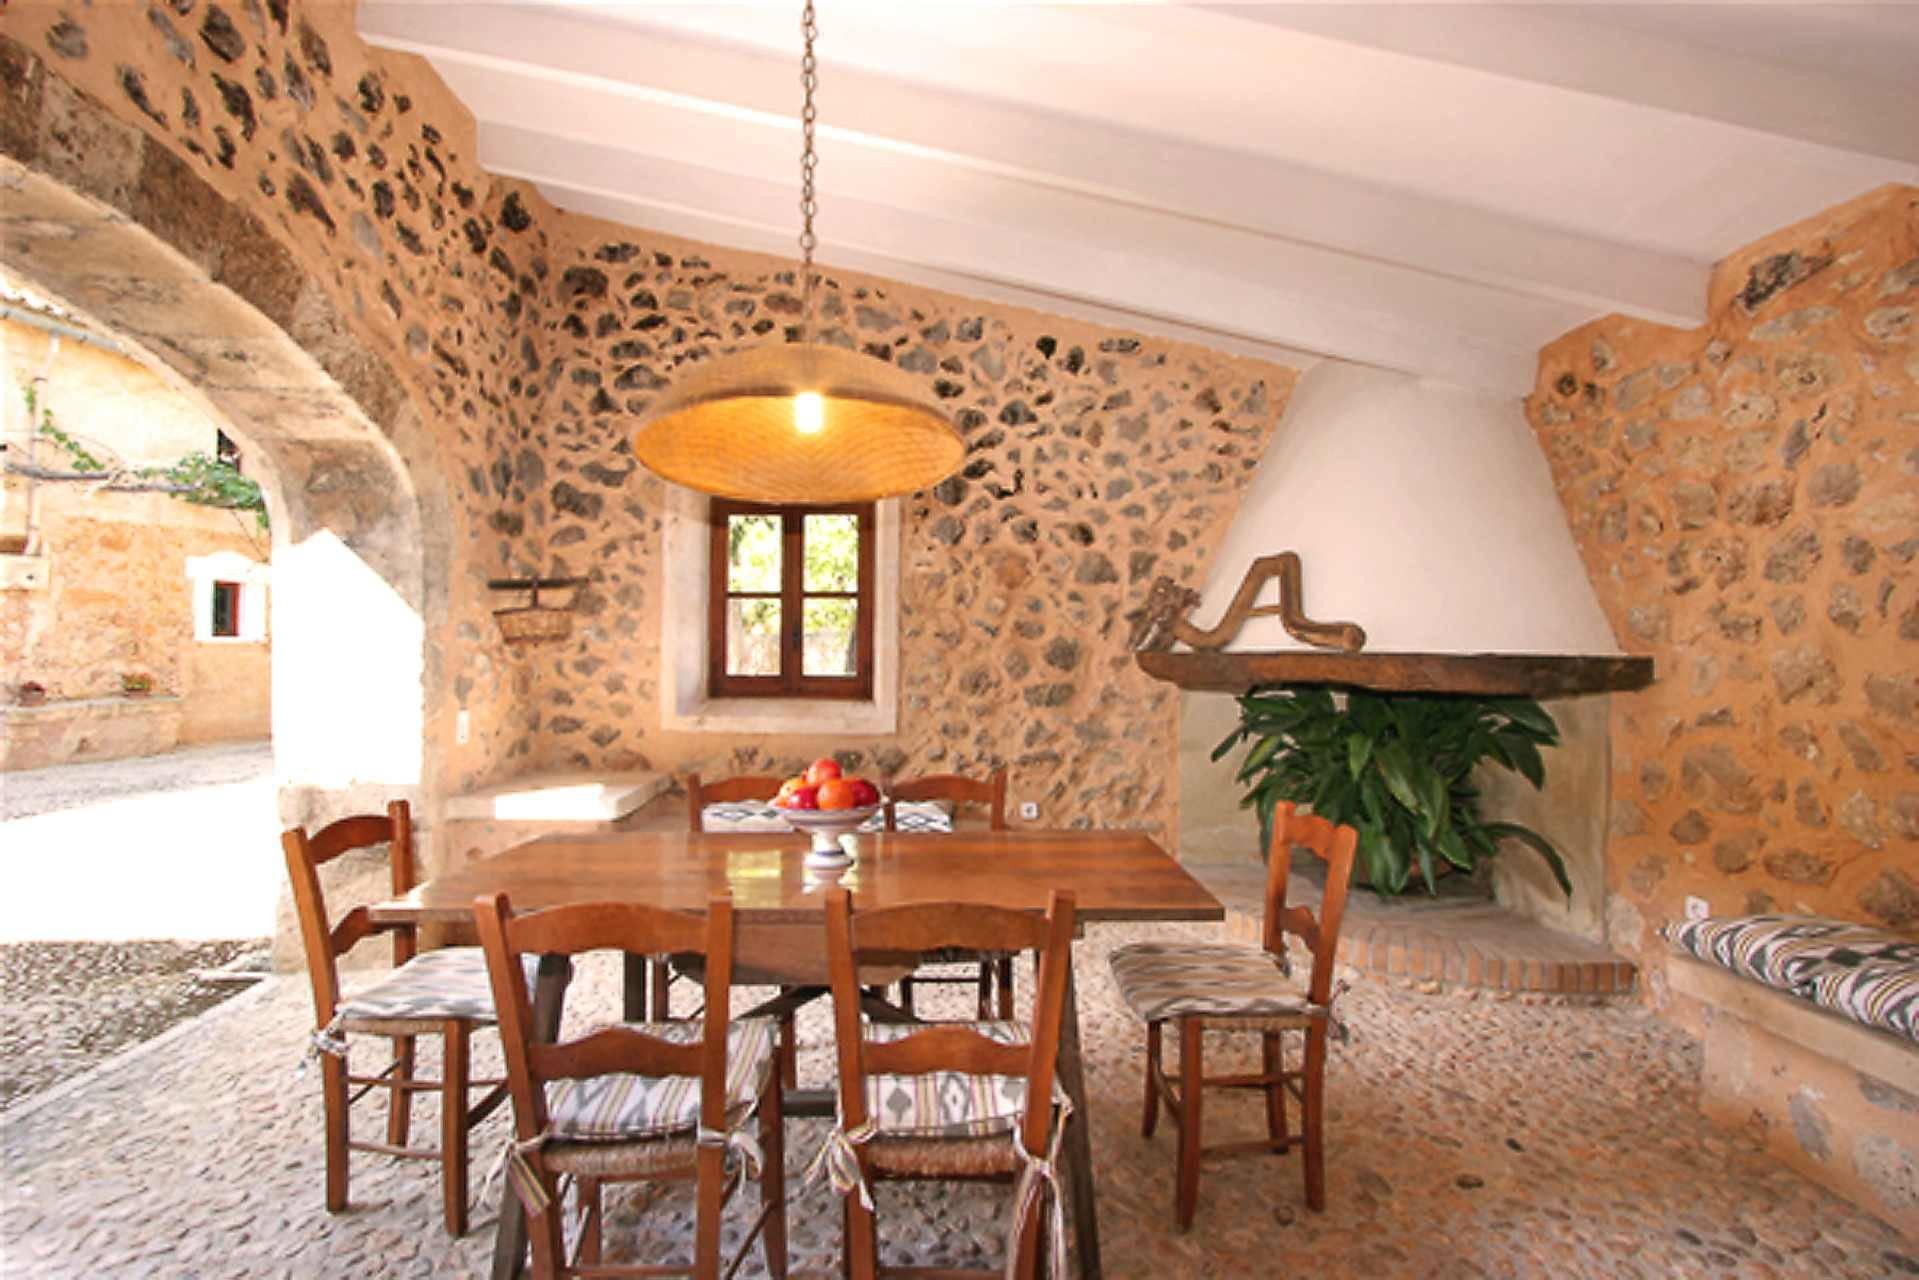 01-06 Charming Holiday Home Mallorca north Bild 4